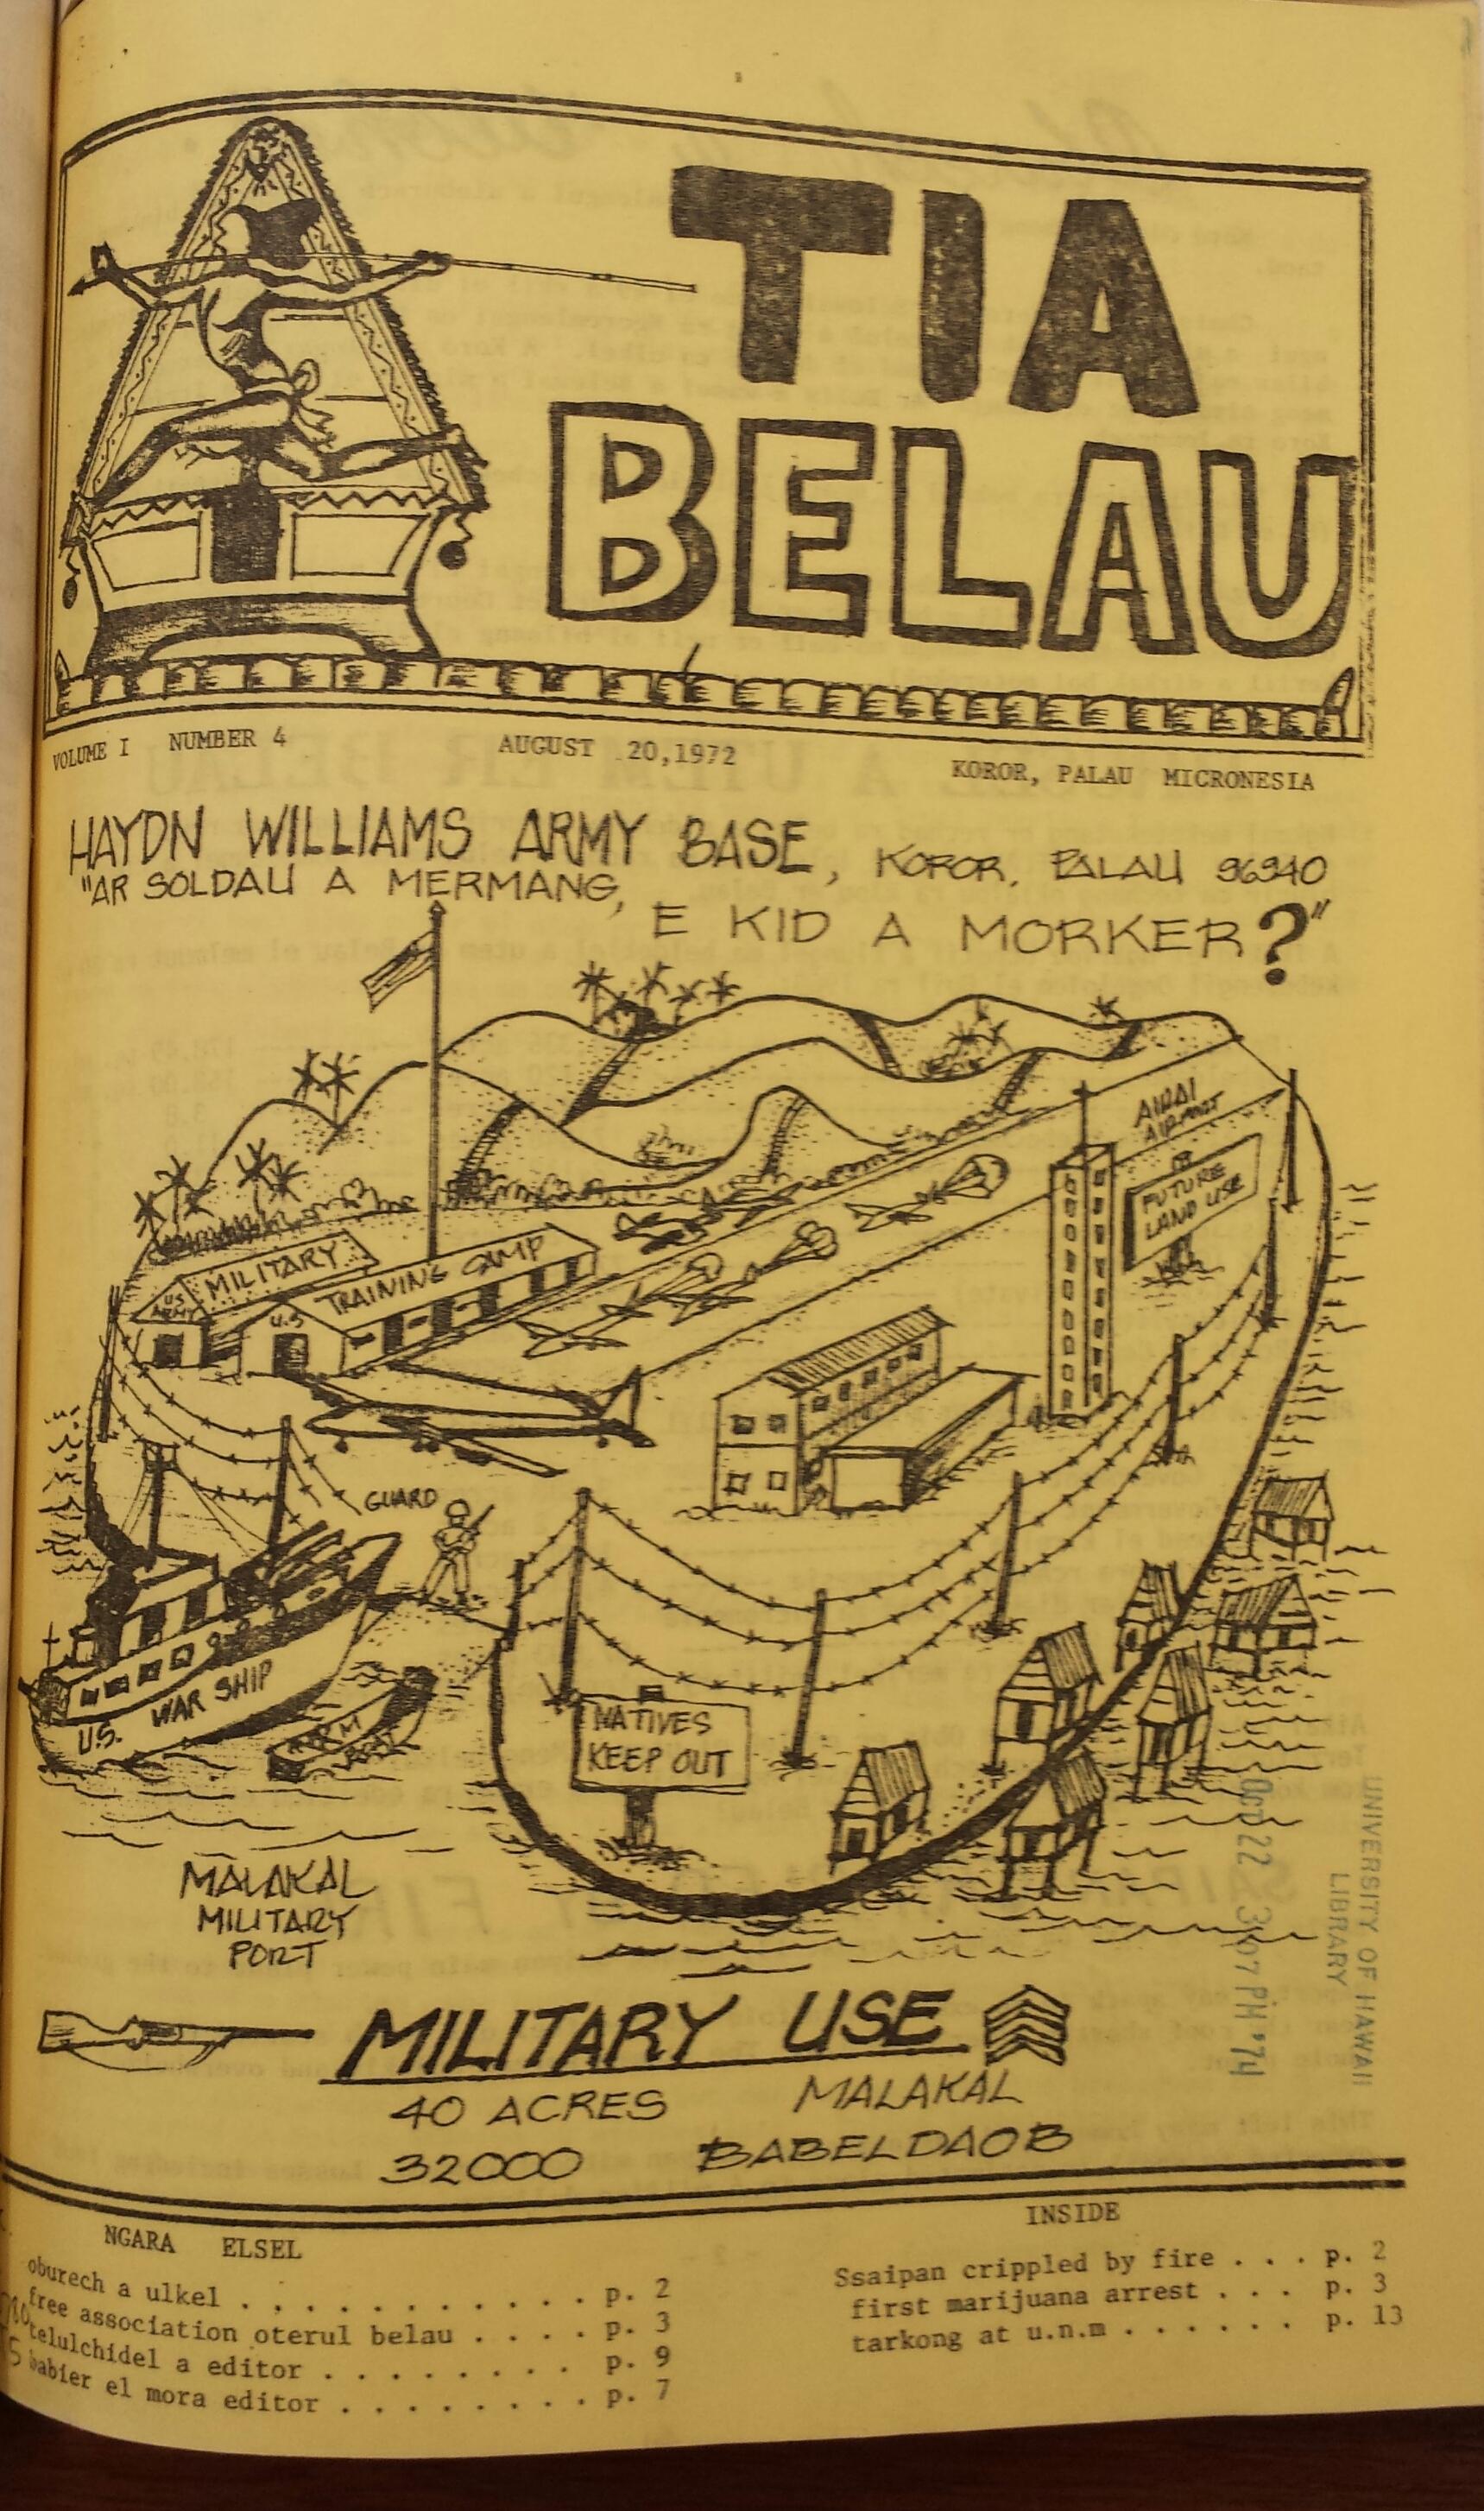 Cover of the 'Tia Belau (Historic)'